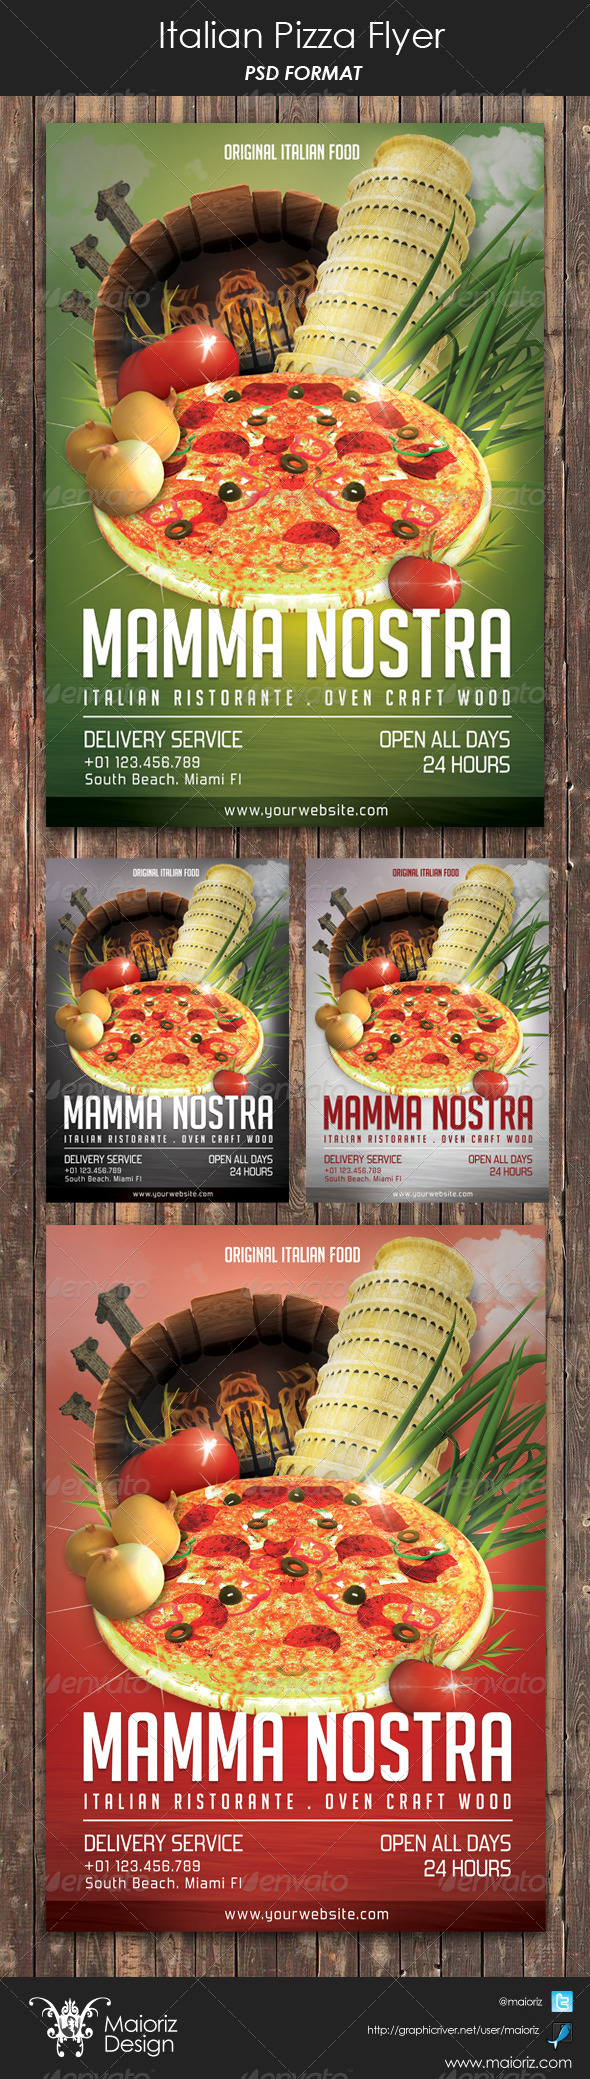 Italian Pizzeria Restaurant Flyer - Restaurant Flyers